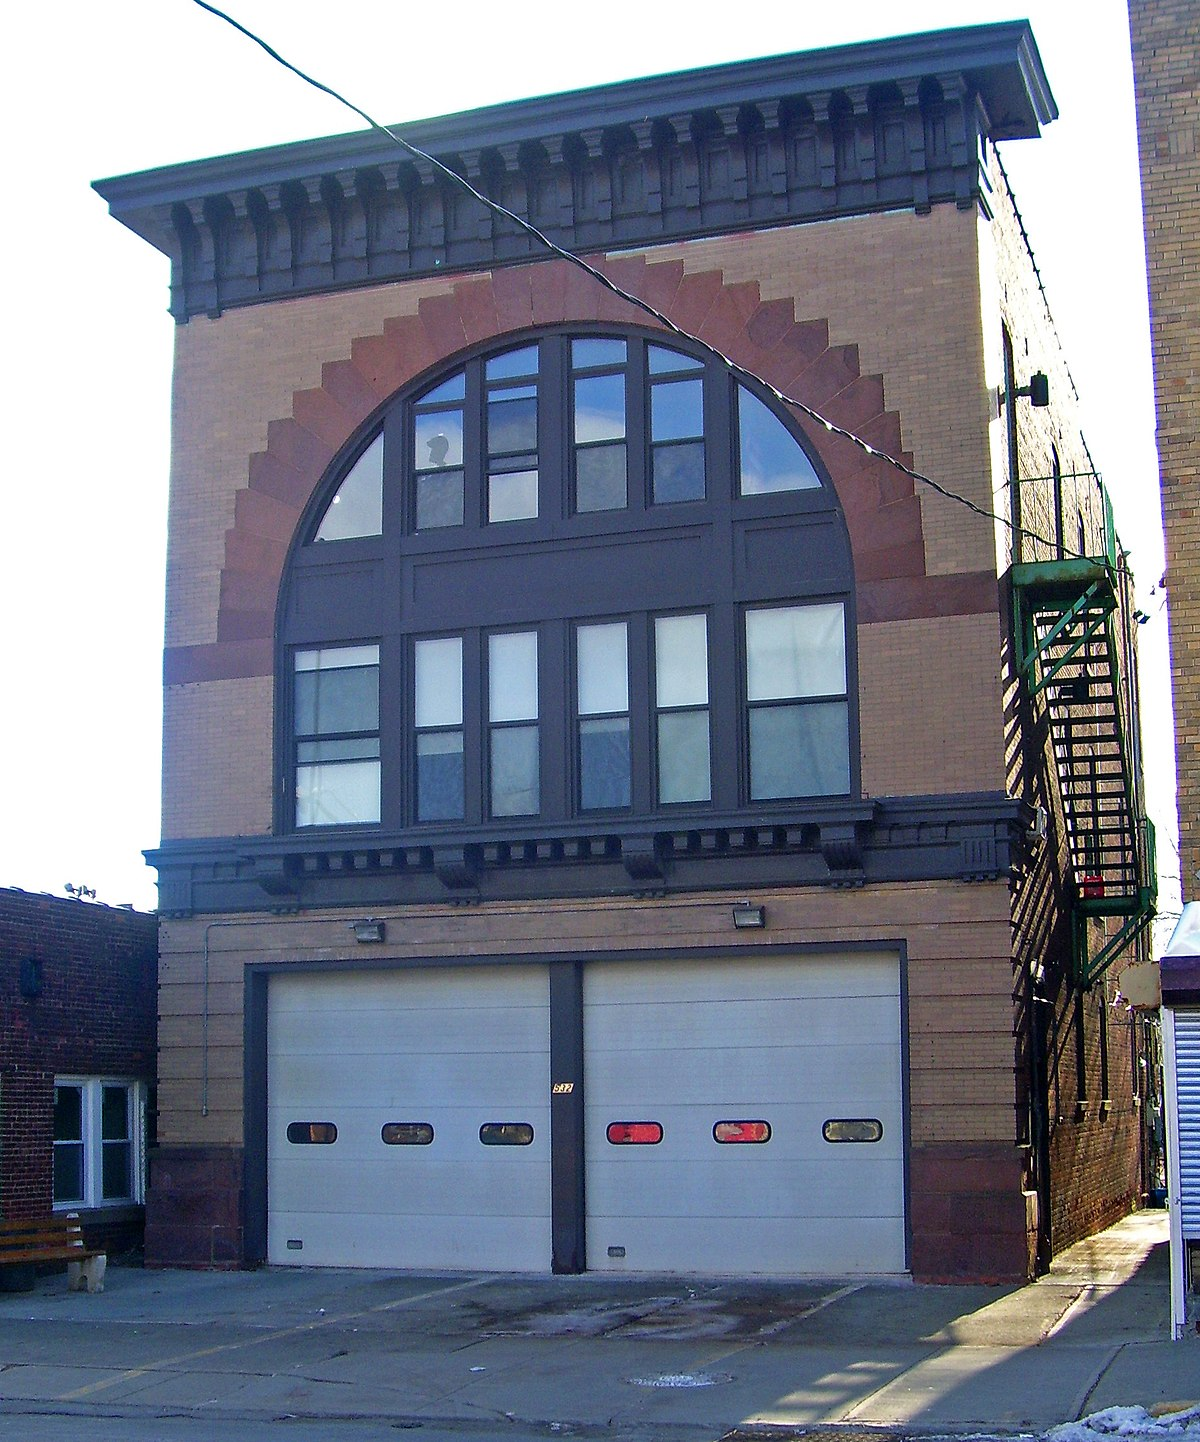 K Pok House Sute Architect: O. H. Booth Hose Company